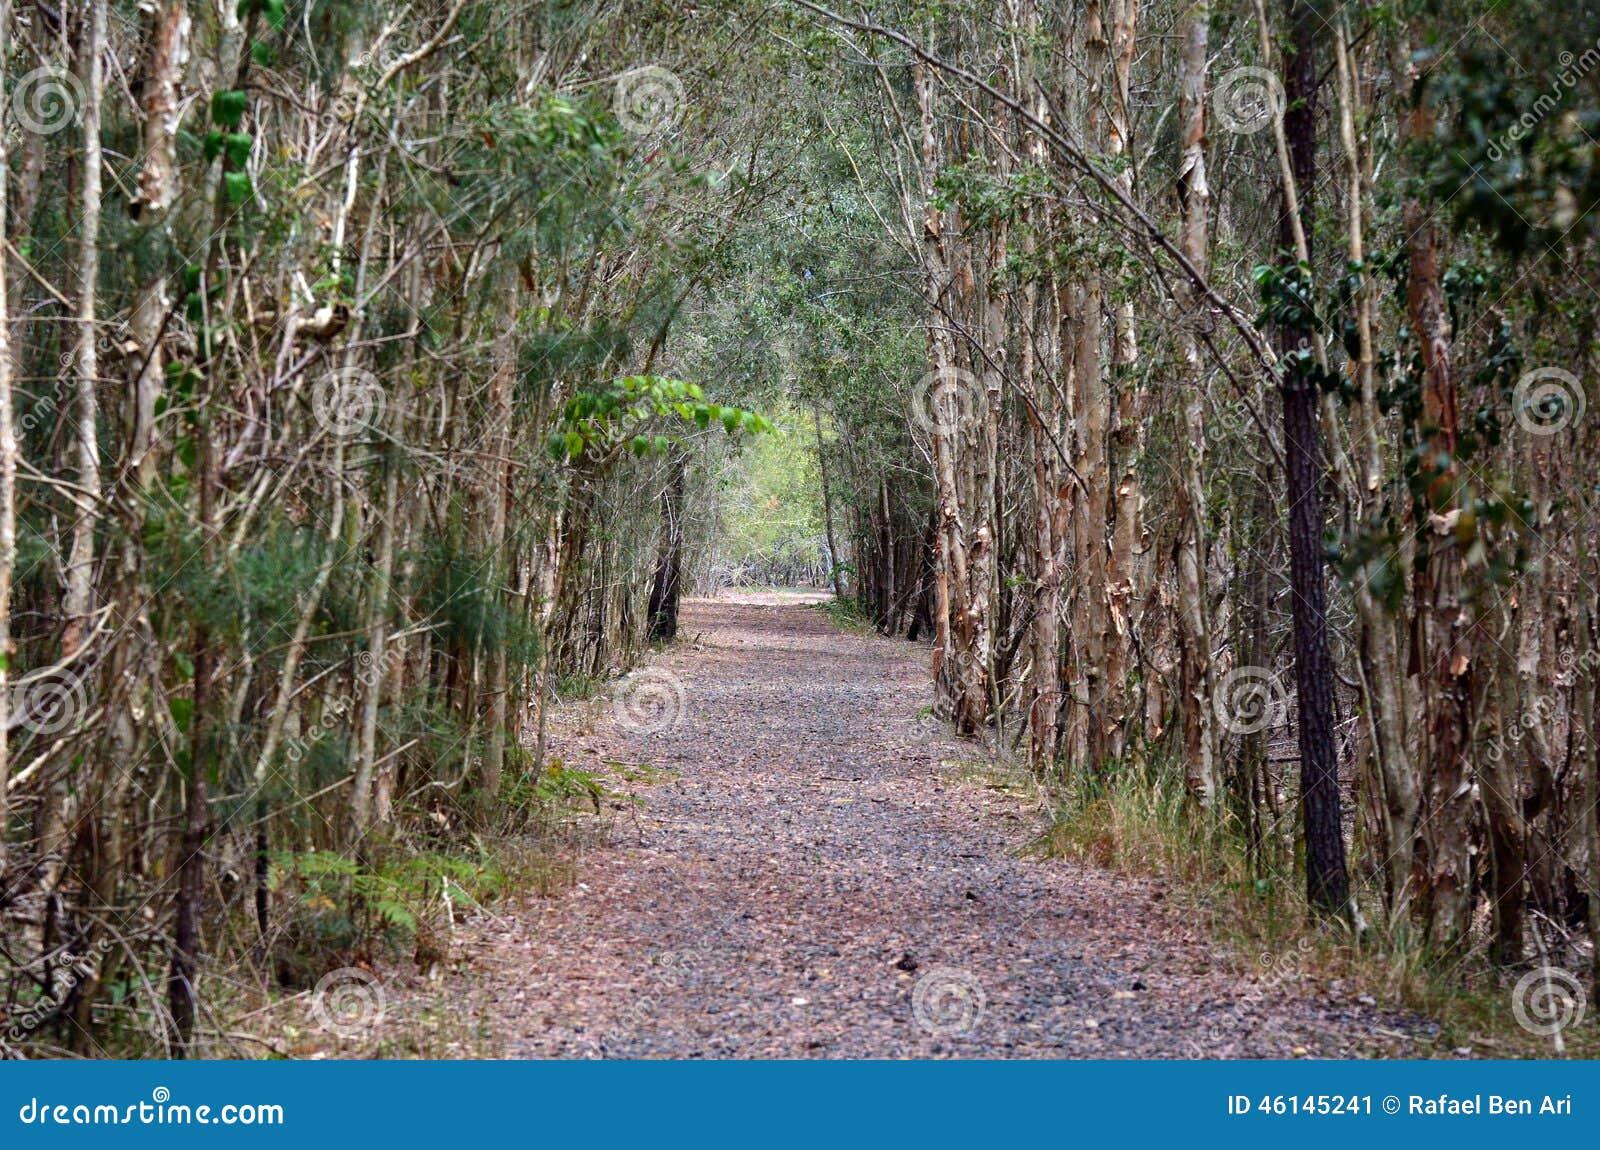 tree path track leaves - photo #23